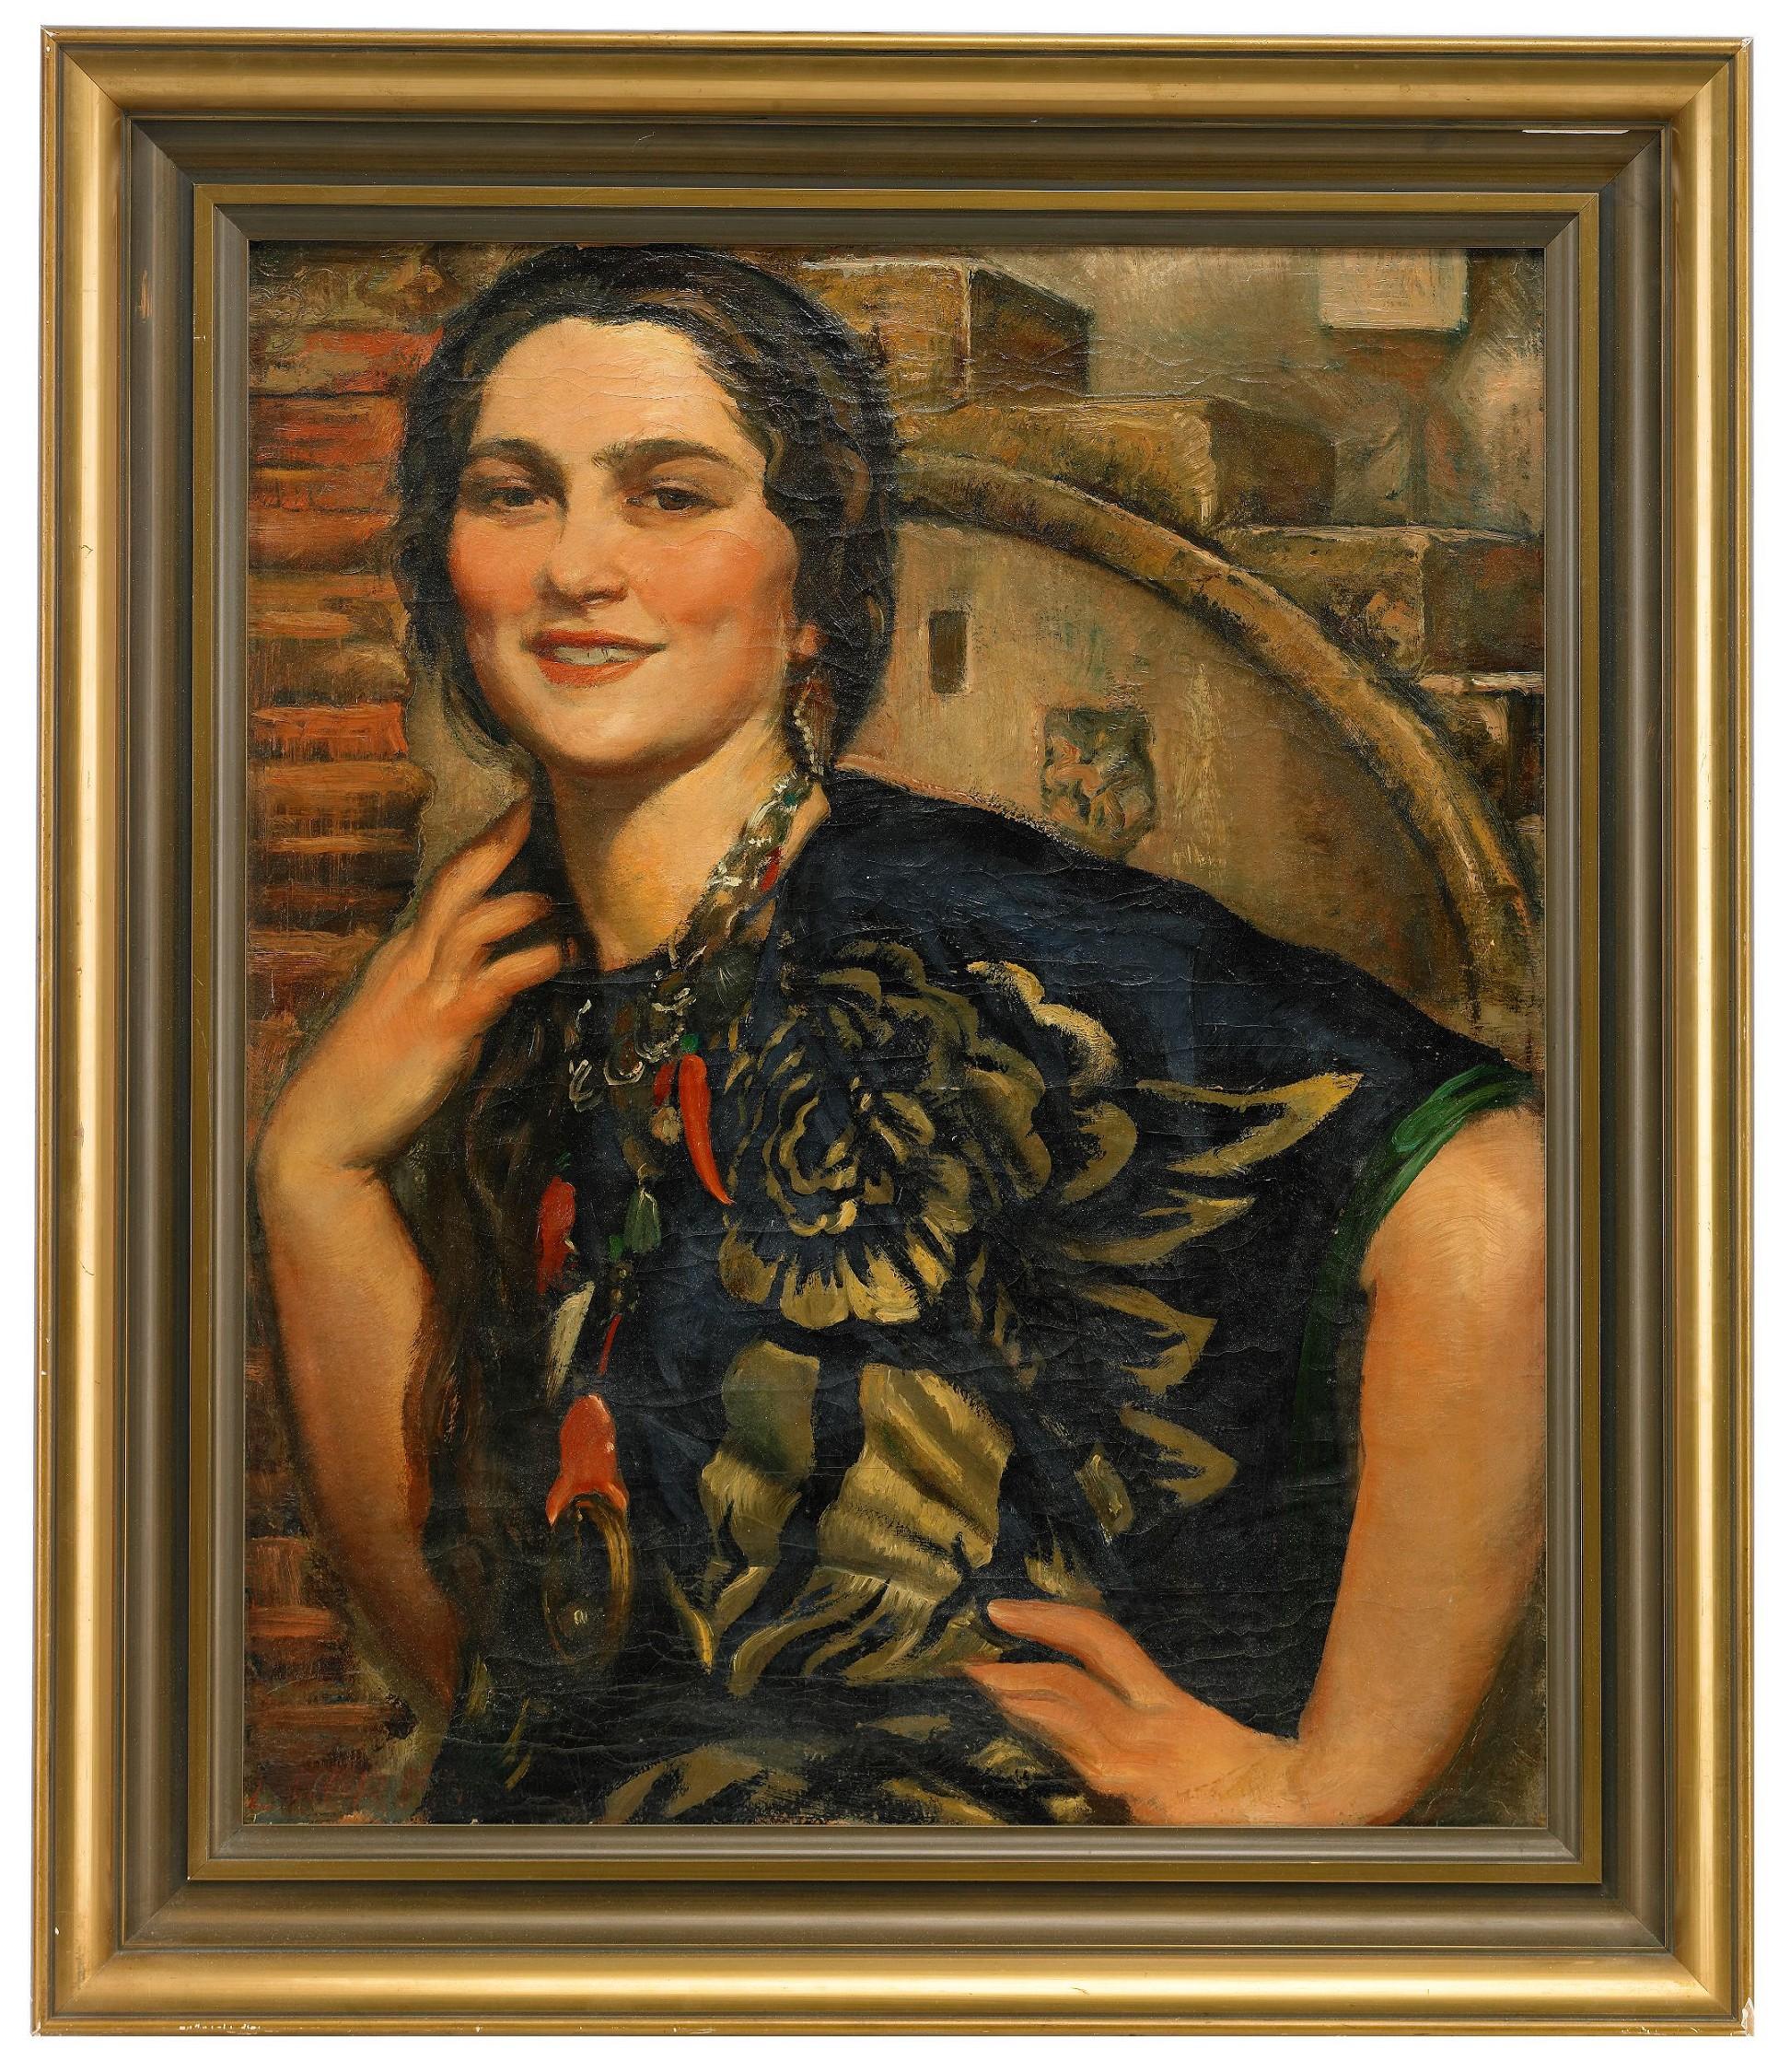 Gosiason Philipp   Portrait of Ukranian girl. Oil on canvas, signed. Size: 70 x 60 cm.